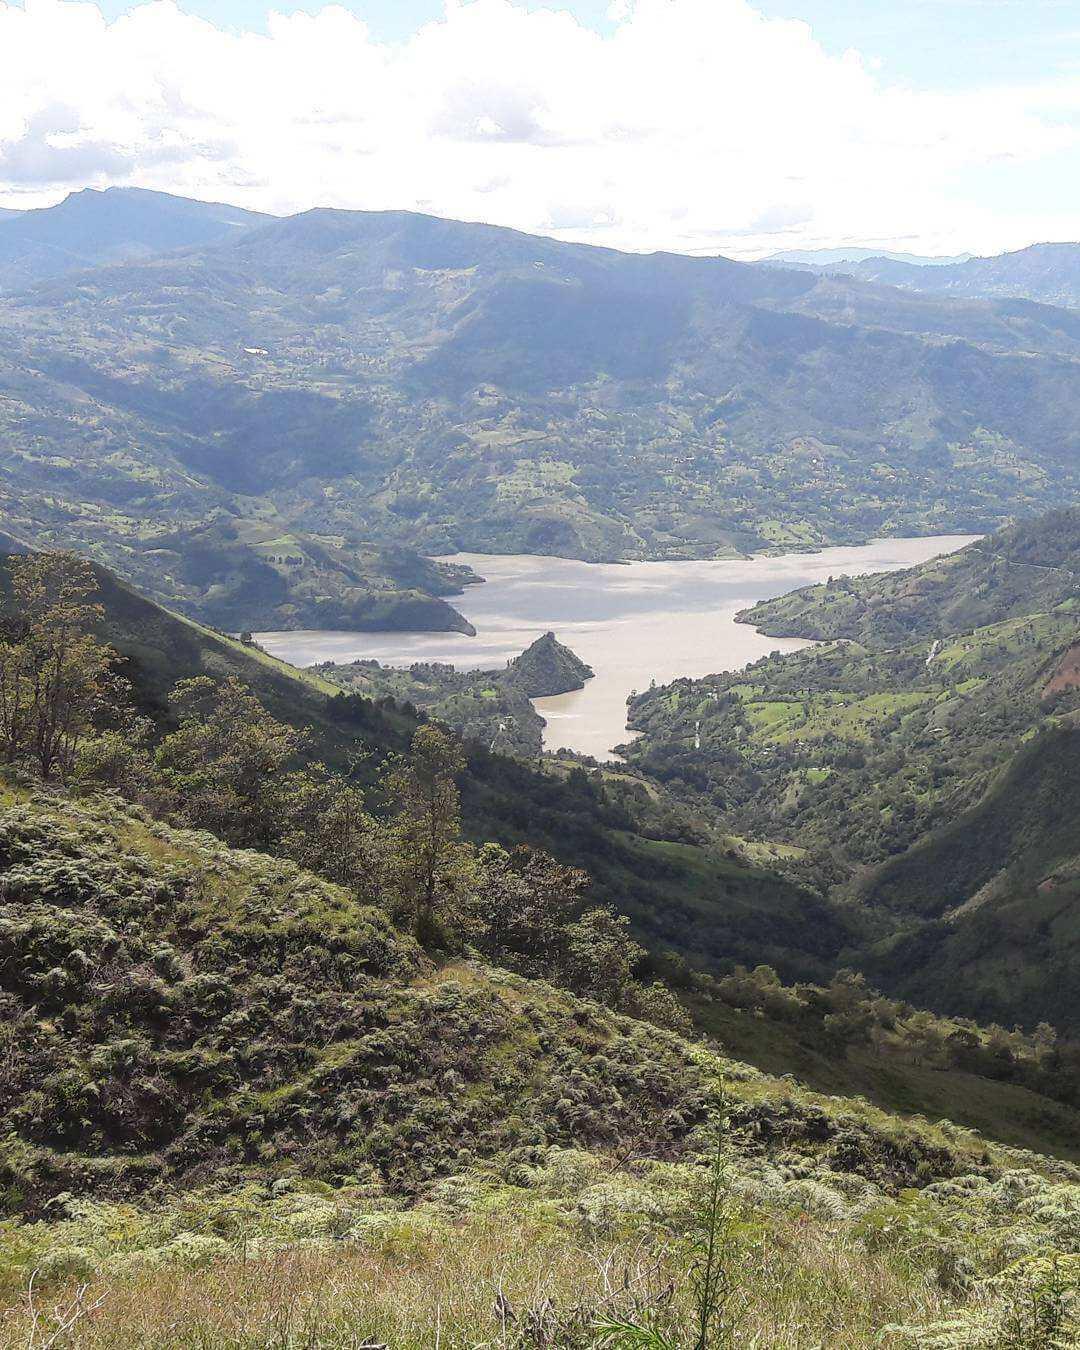 Lagunas de Boyacá